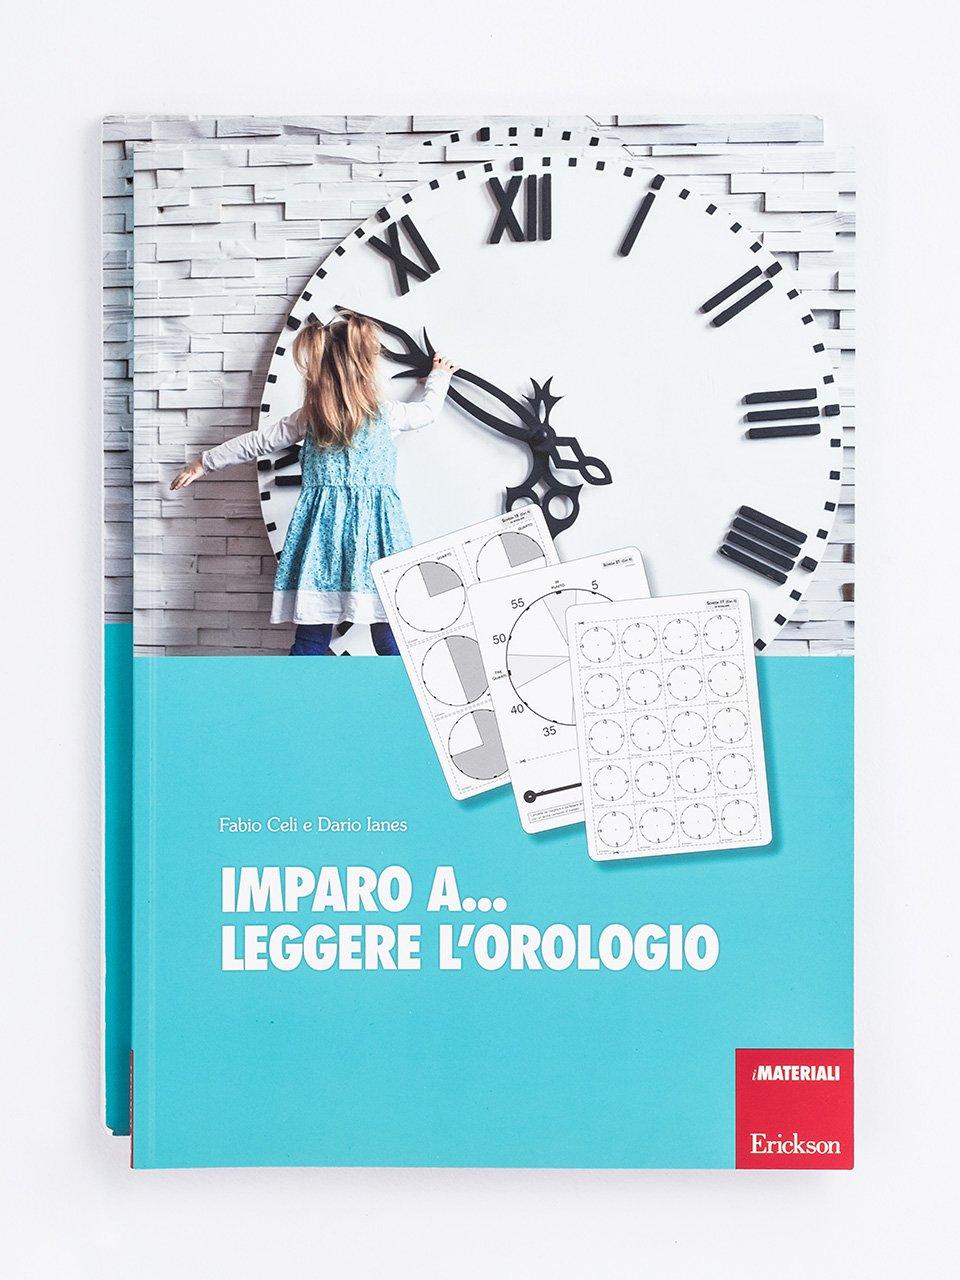 Imparo a... leggere l'orologio - Dario Ianes - Erickson